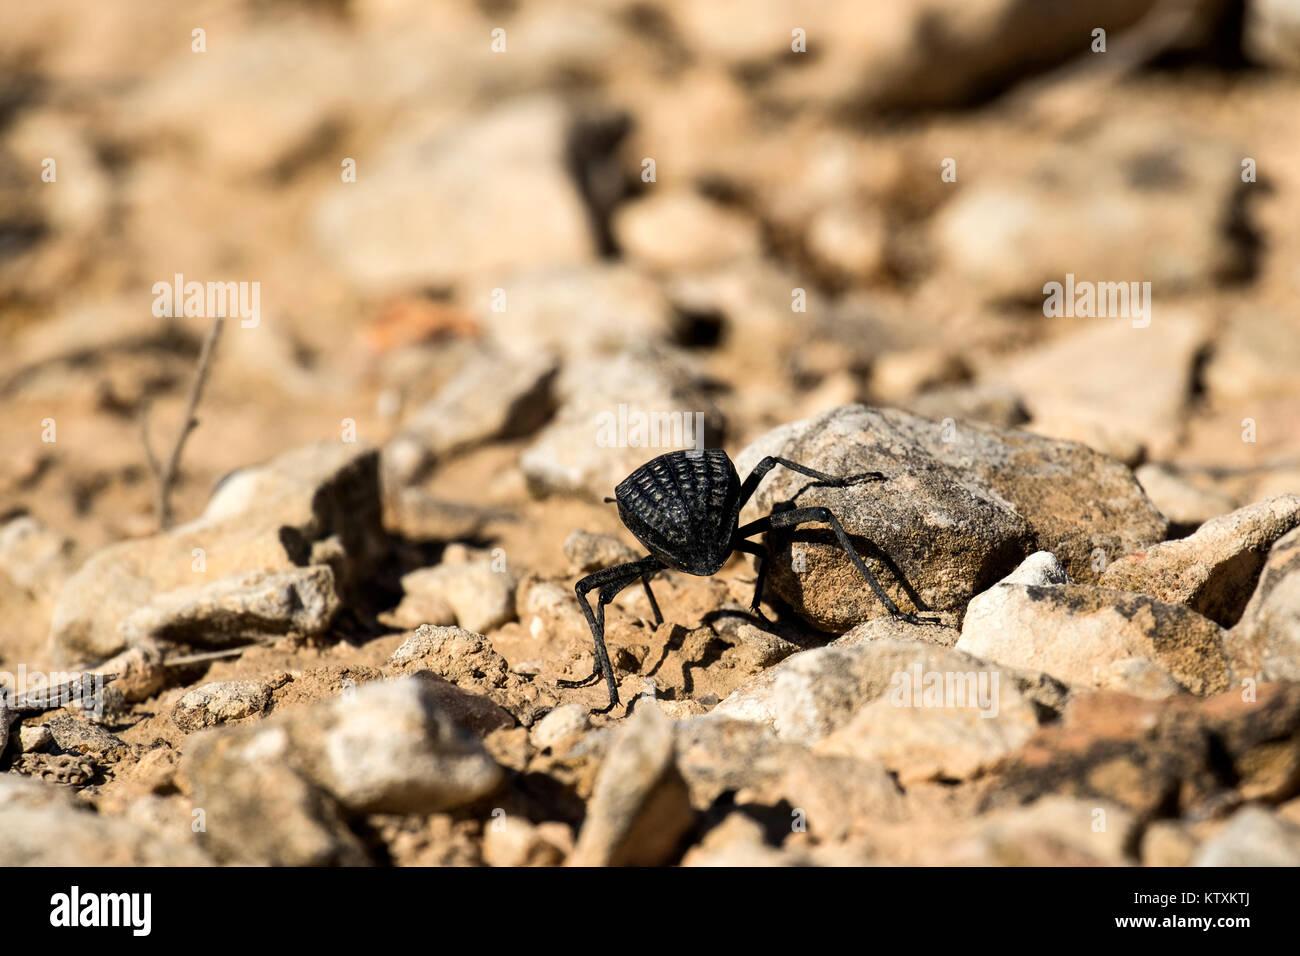 Beetle from the family of darkling beetles (Pimelia bipunctata) - Stock Image